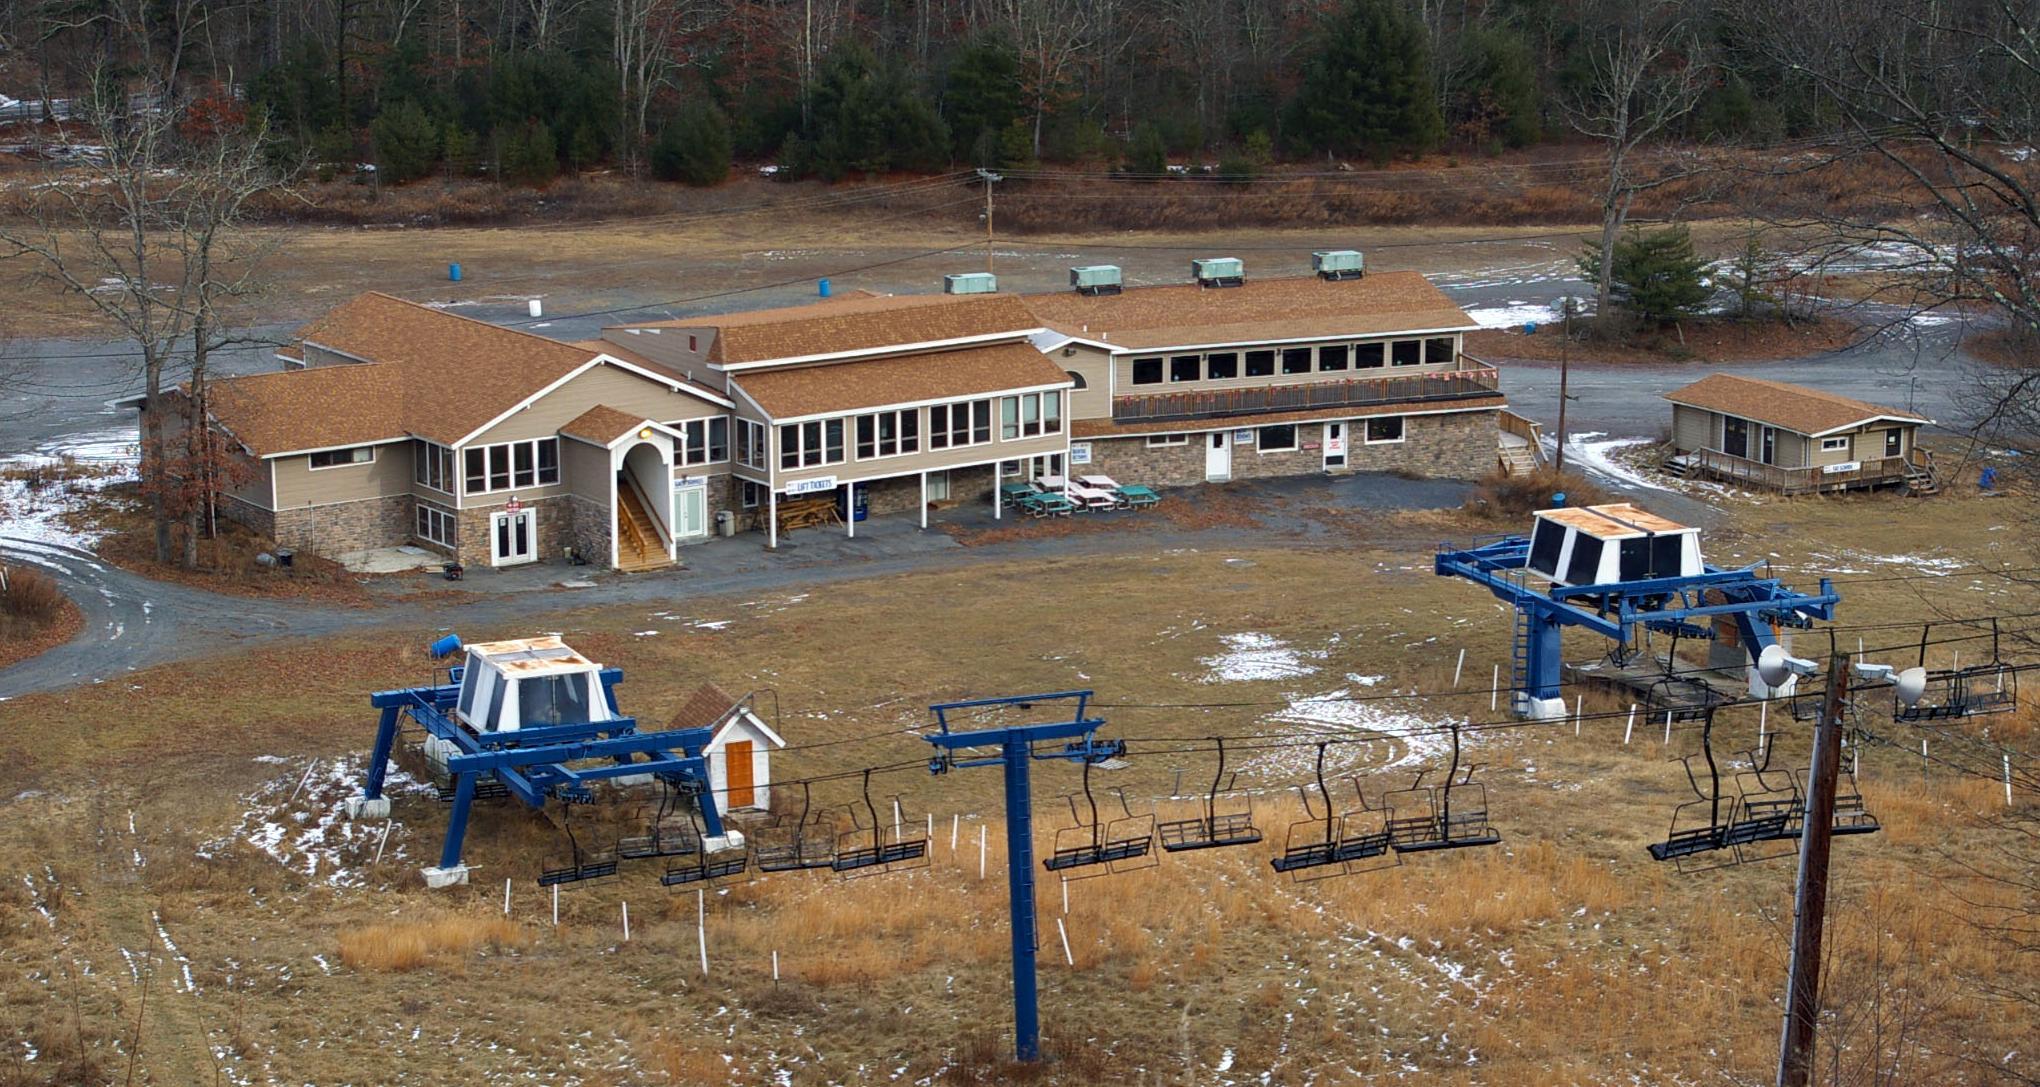 closed pennsylvania ski area up for sale   first tracks!! online ski